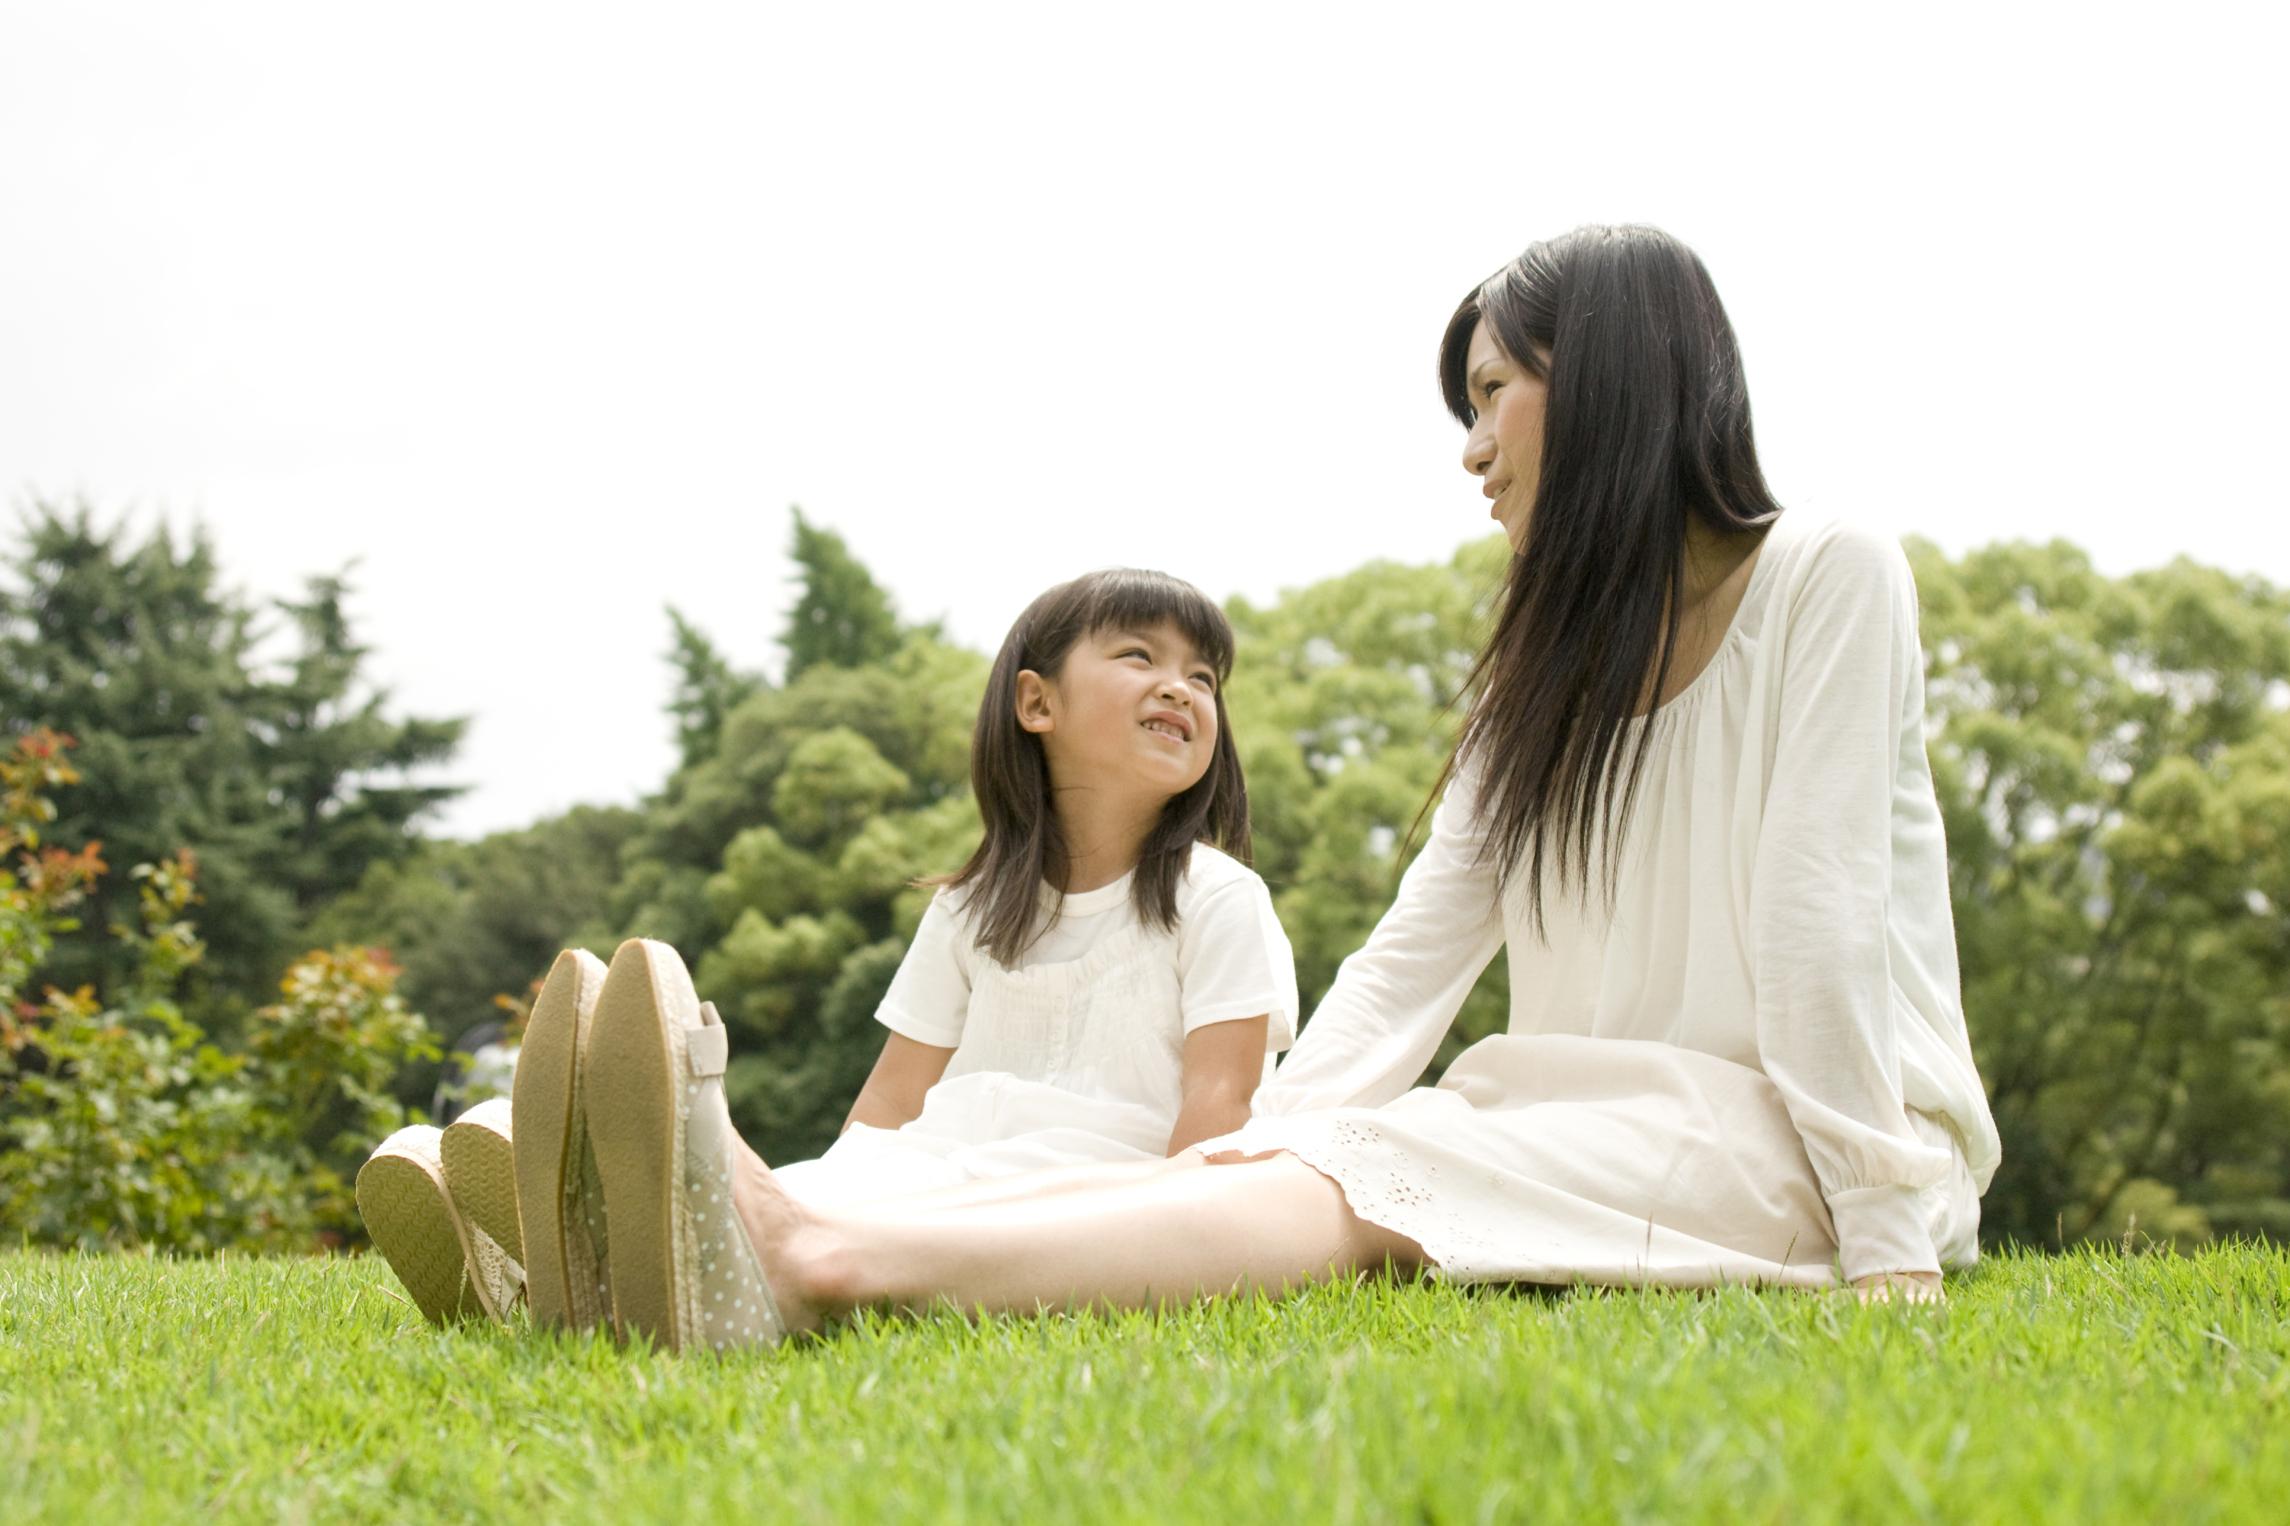 What Is Telegraphic Speech for Children – Telegraphic Speech Example